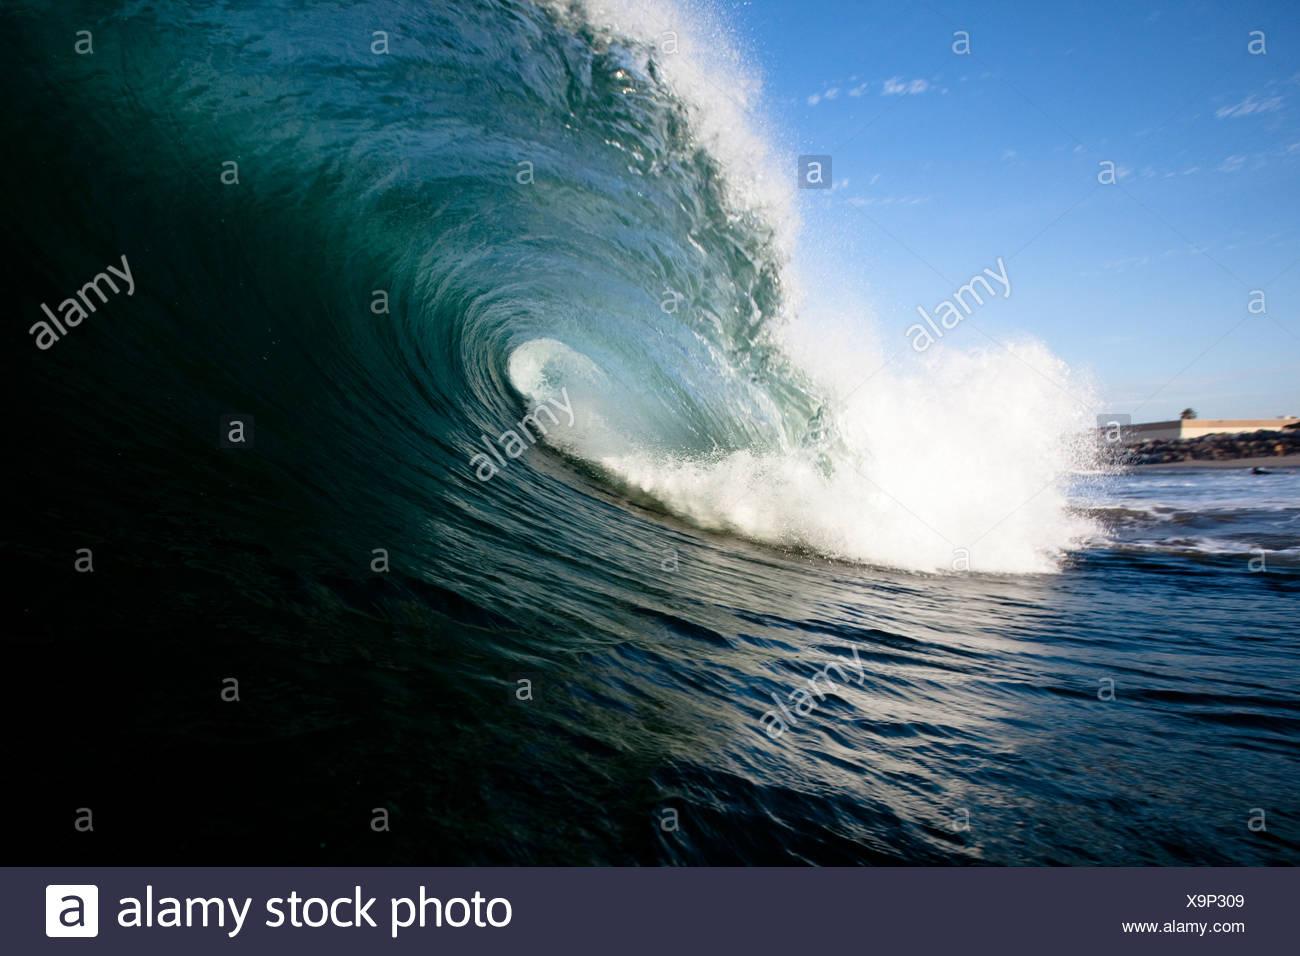 Una gran ola se rompe cerca de la orilla. Imagen De Stock